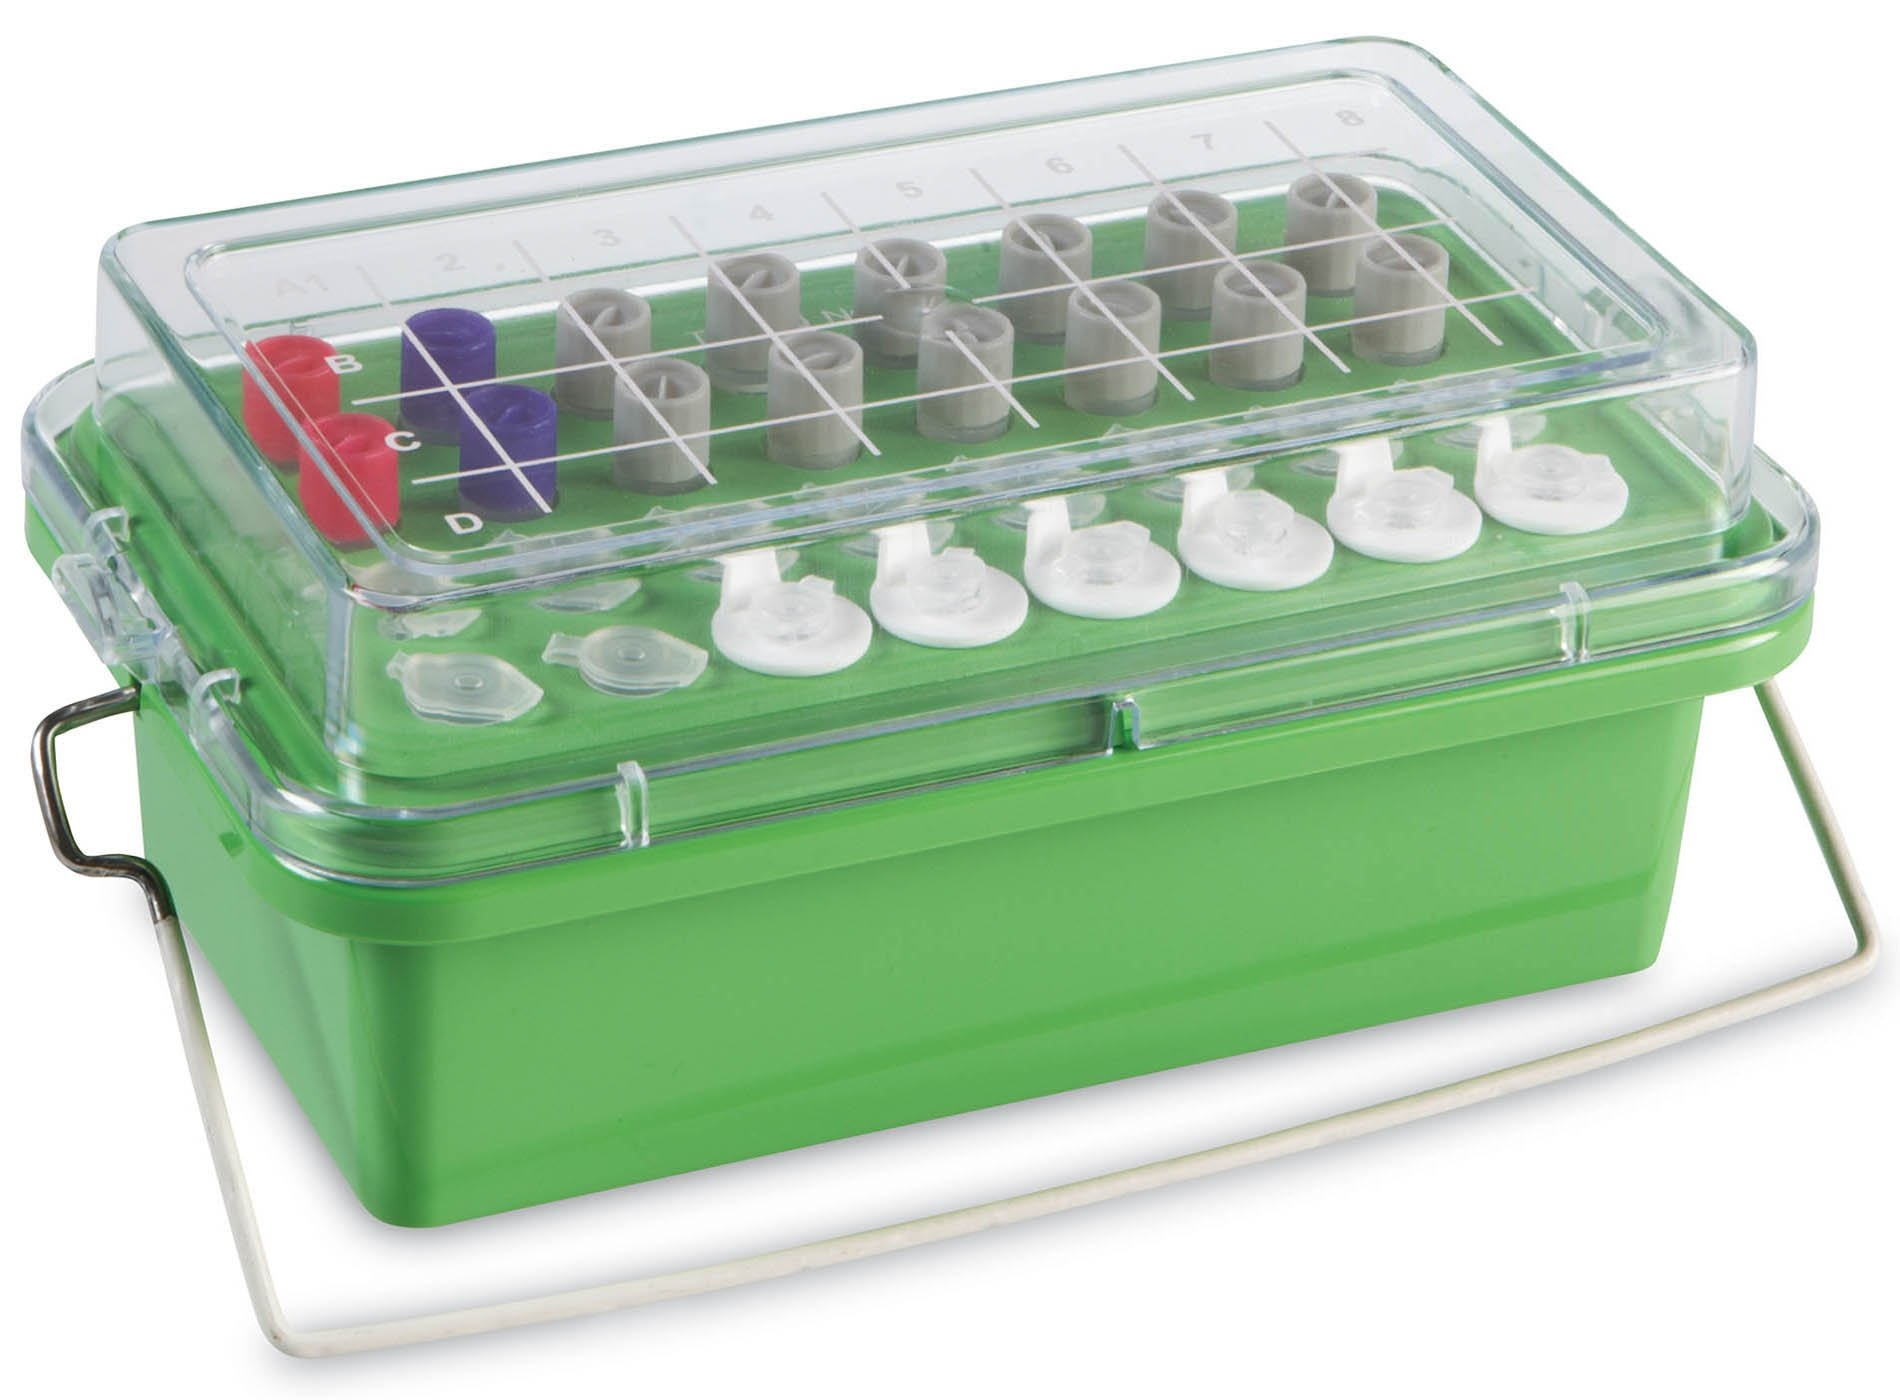 True North Green Mini Cooler 0 Degrees C - Clear Lid - 32 x 0.5-2.0 mL